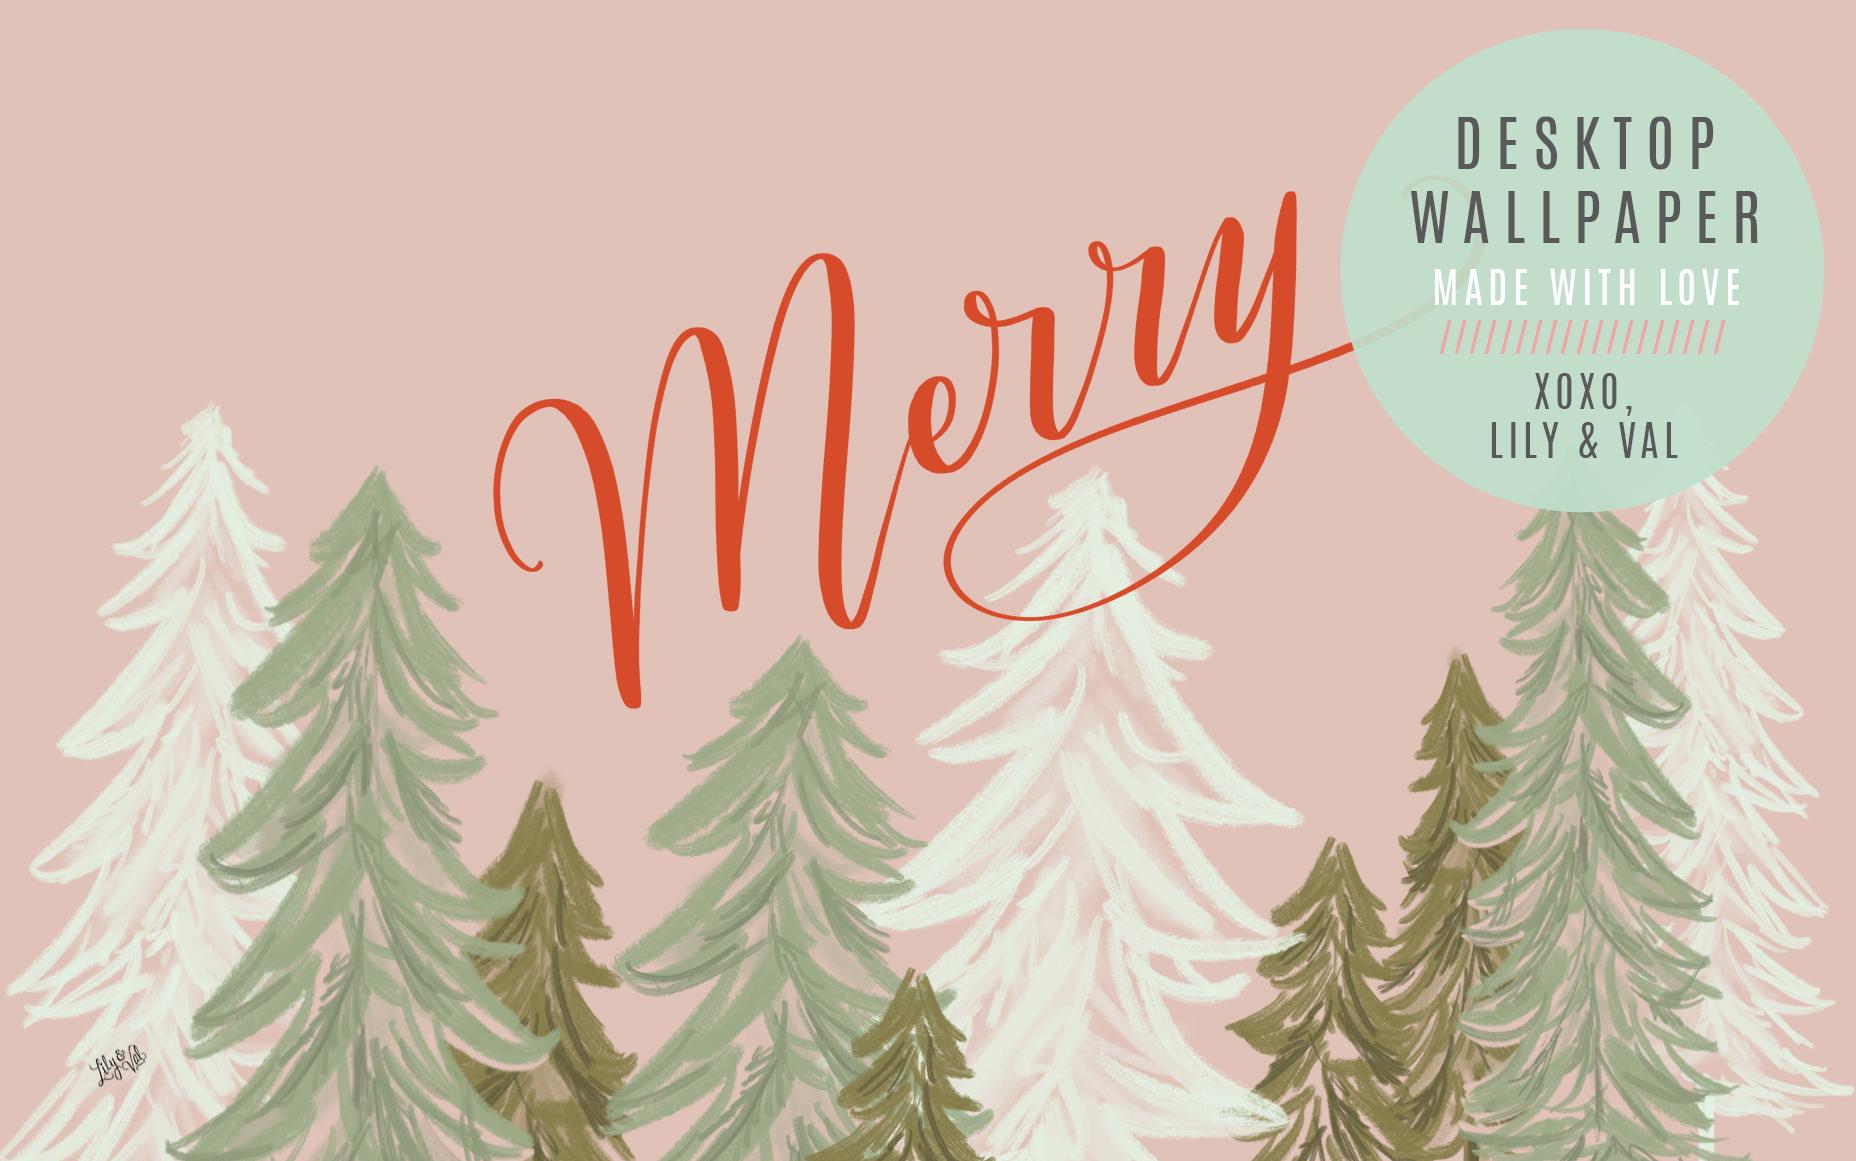 December S Merry Free Desktop Download Lily Val Living Desktop Wallpaper Art Aesthetic Desktop Wallpaper Xmas Wallpaper